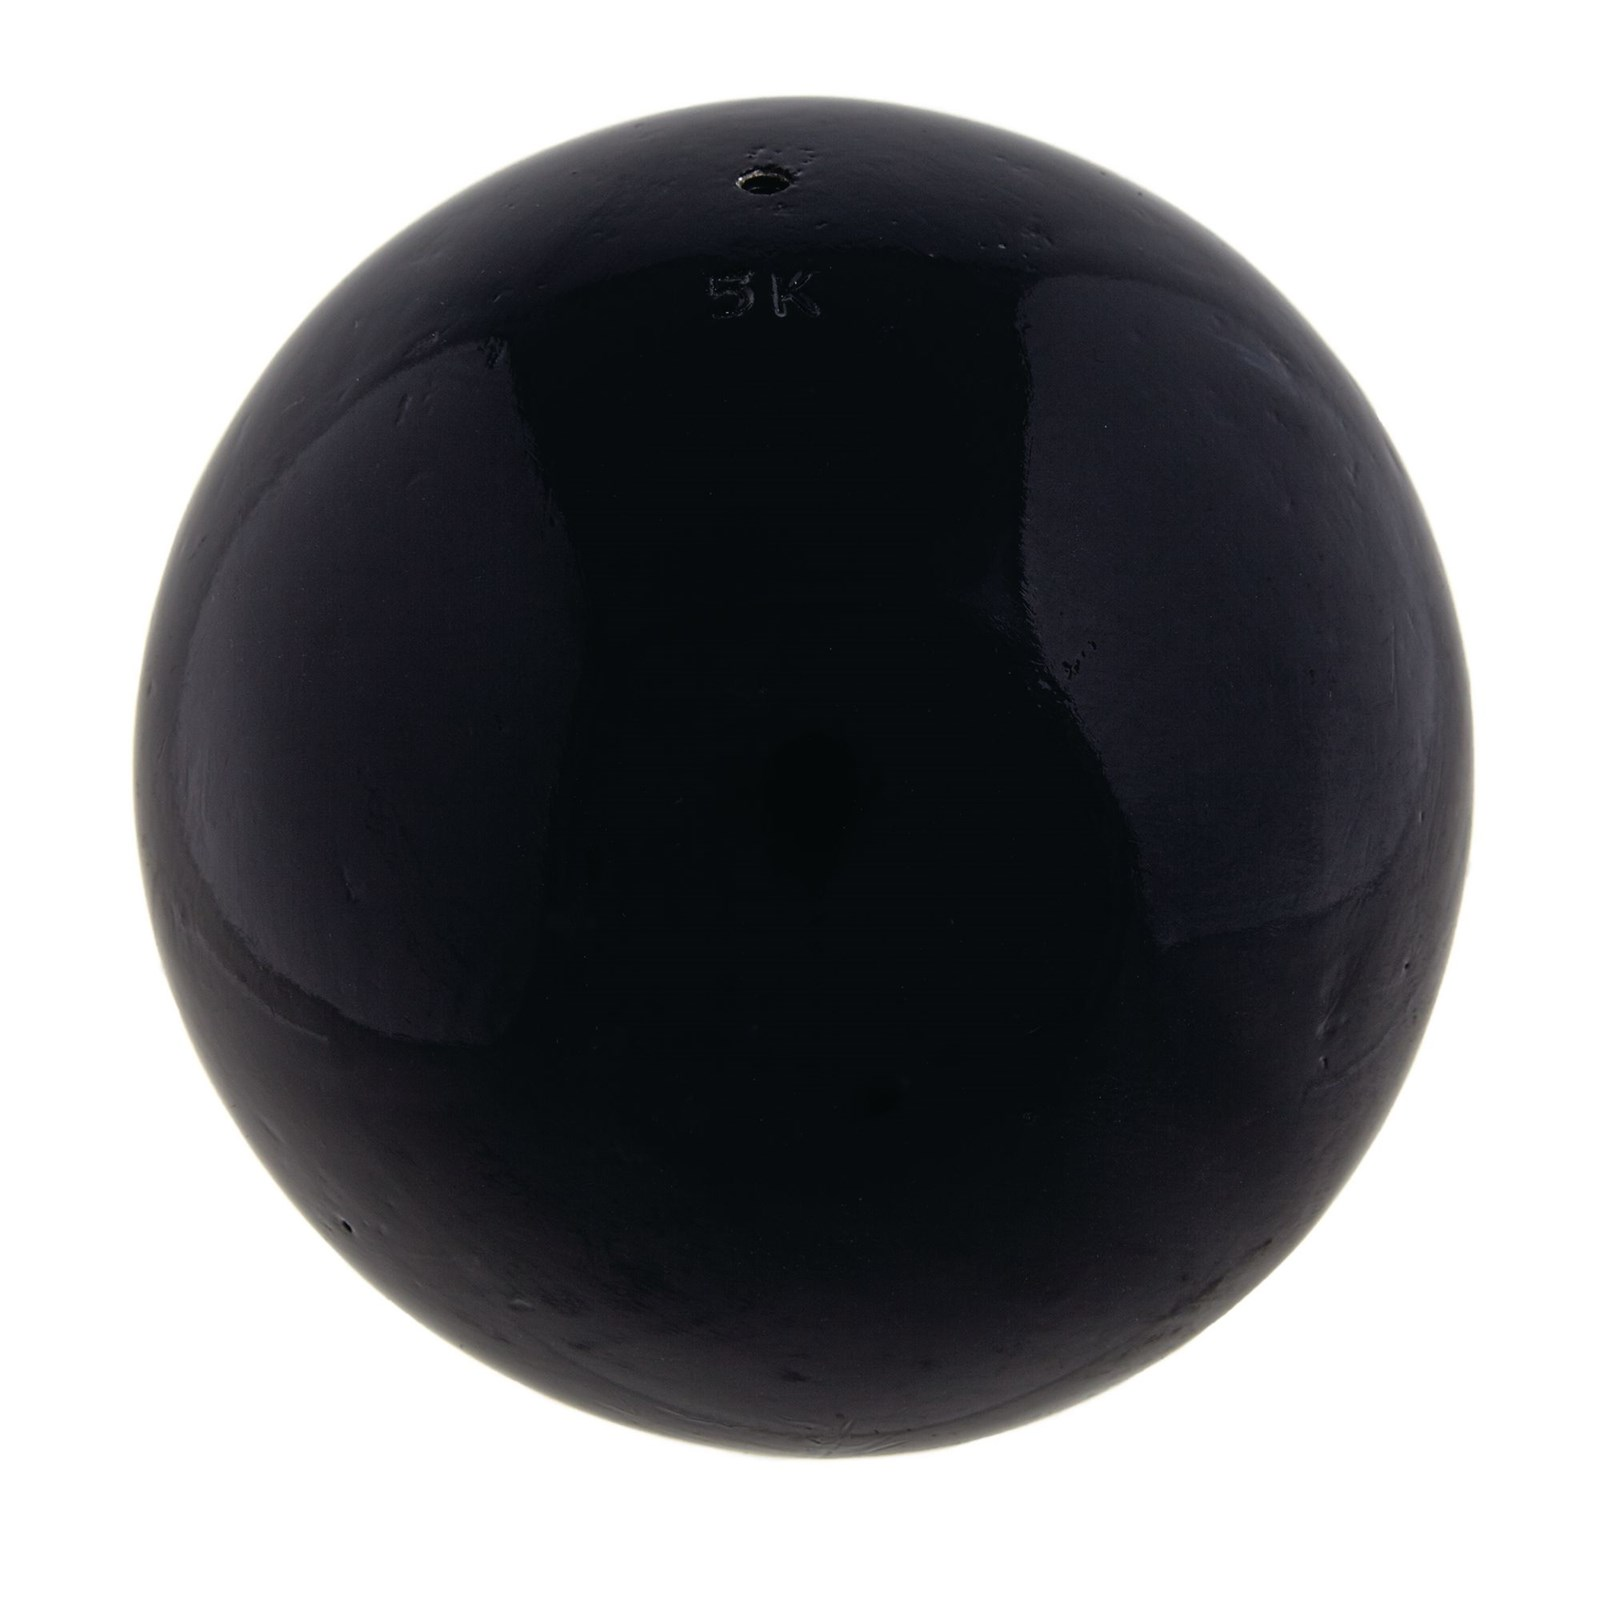 Vinex Cast Iron Shot Put - 5kg - Black